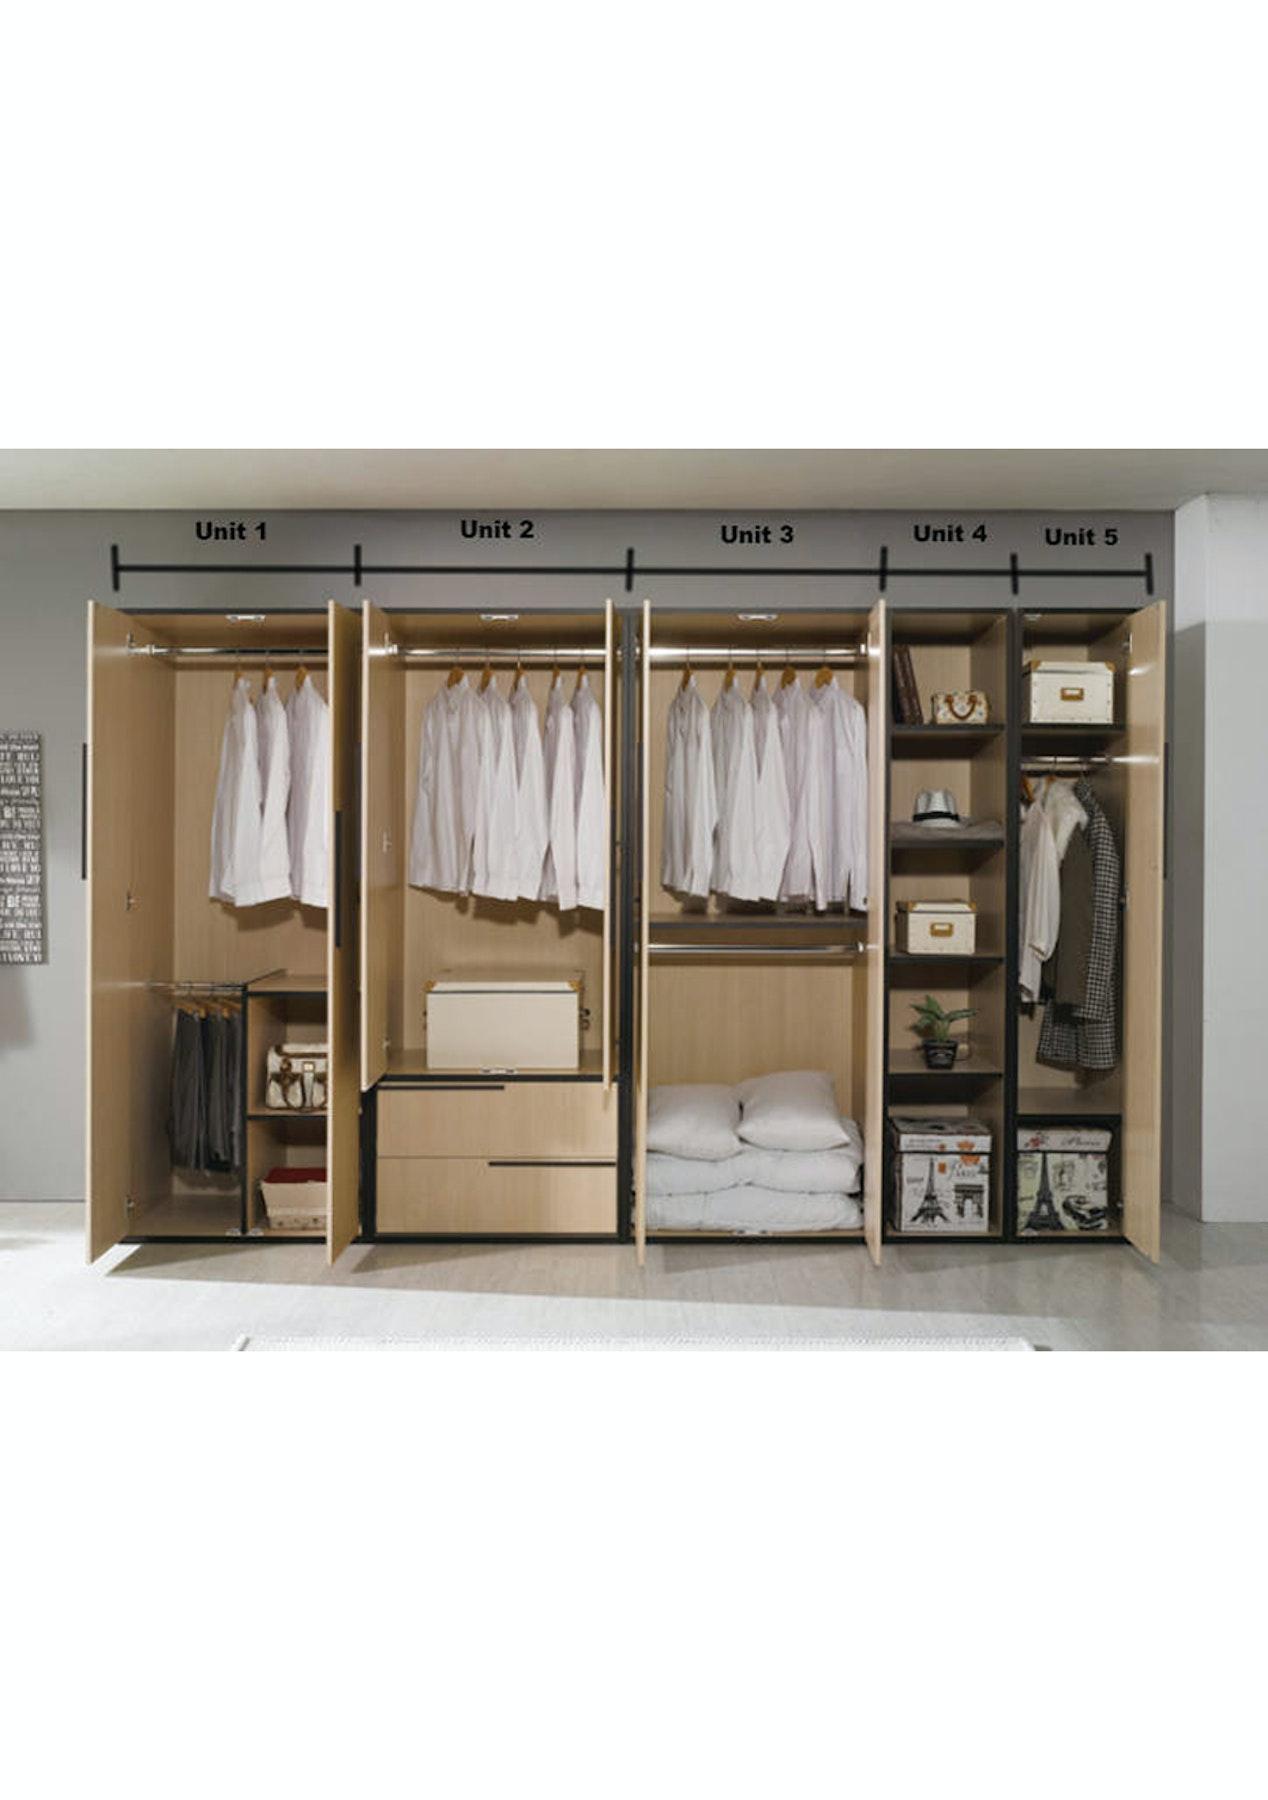 Miki Wardrobe Storage Cabinets Unit 1 Designer Wardrobe Systems